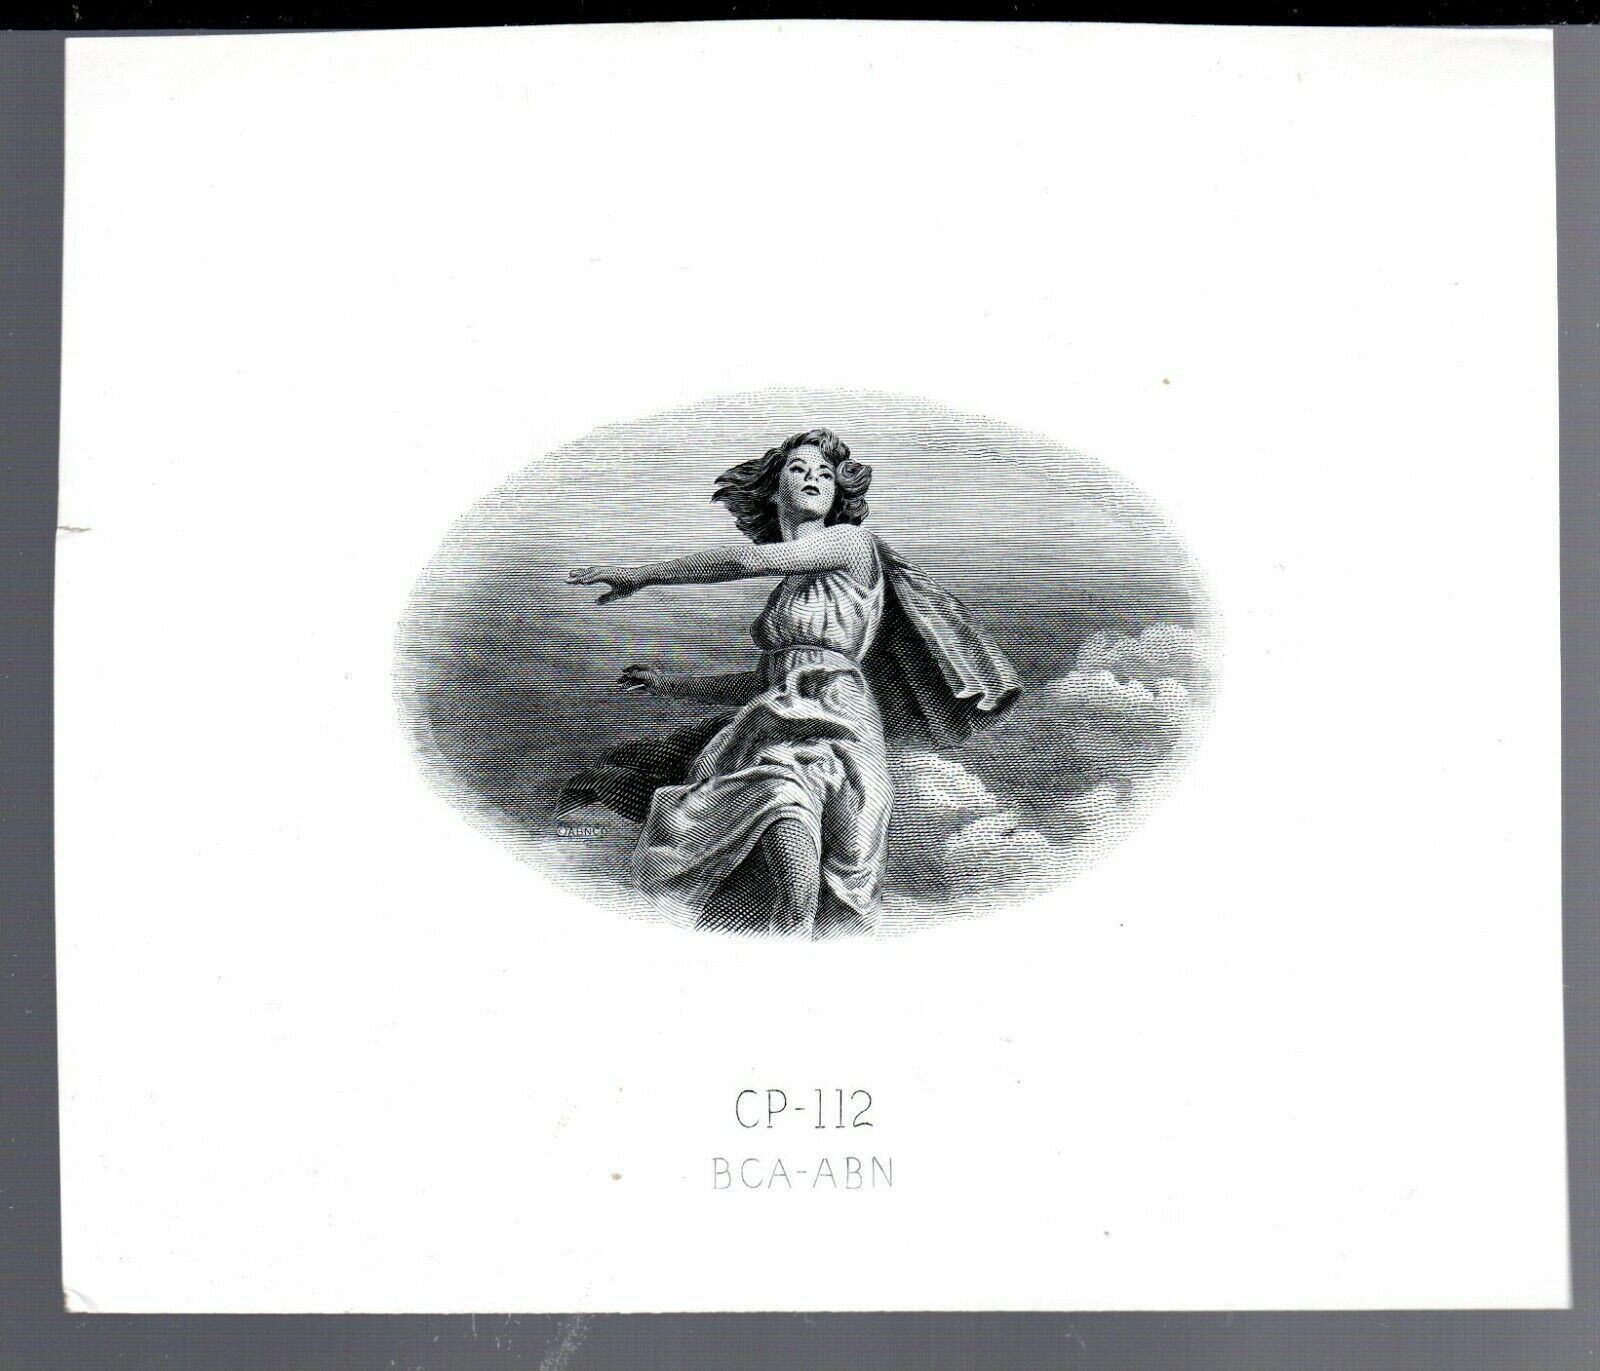 BCA_ABN female figure.jpg